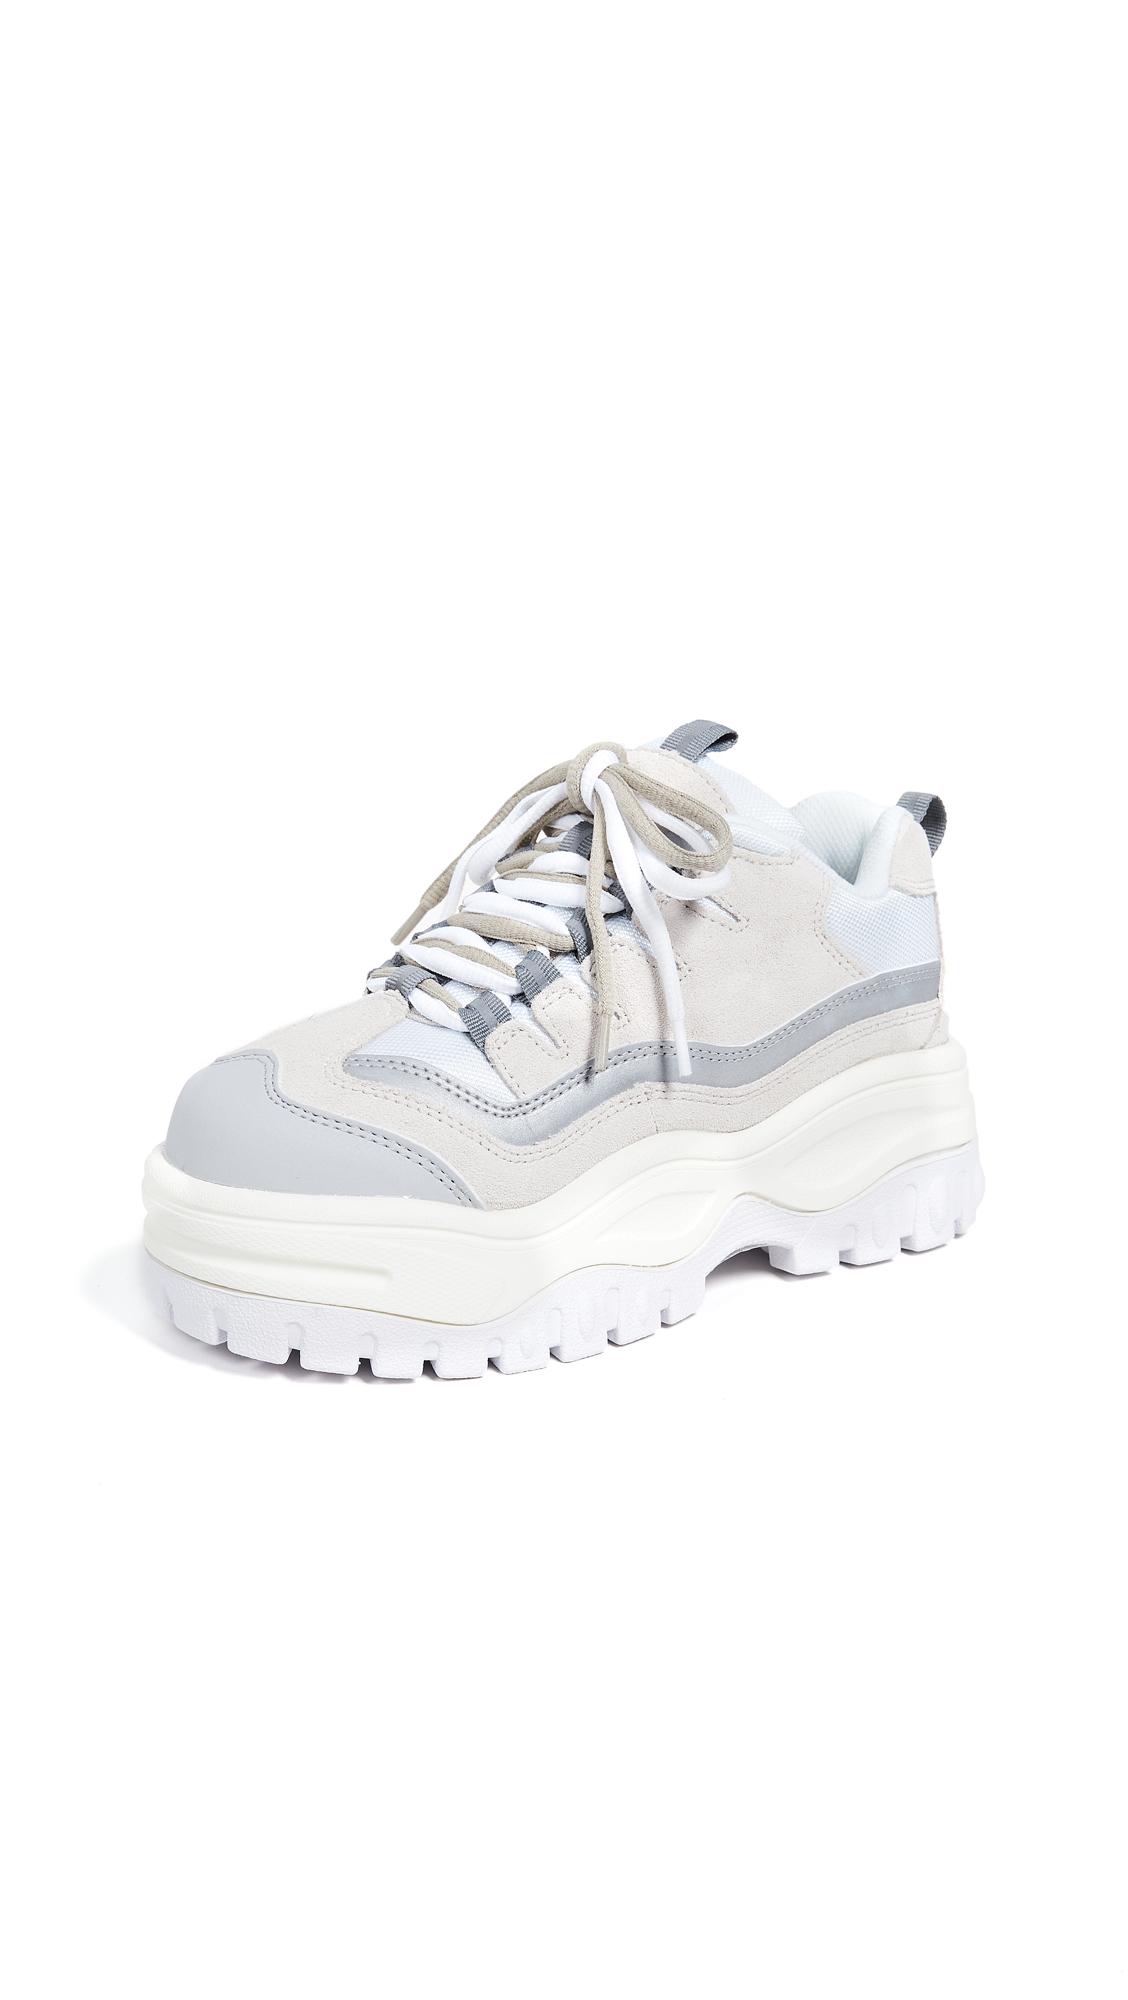 Jeffrey Campbell Pro Era Sneakers - White Multi